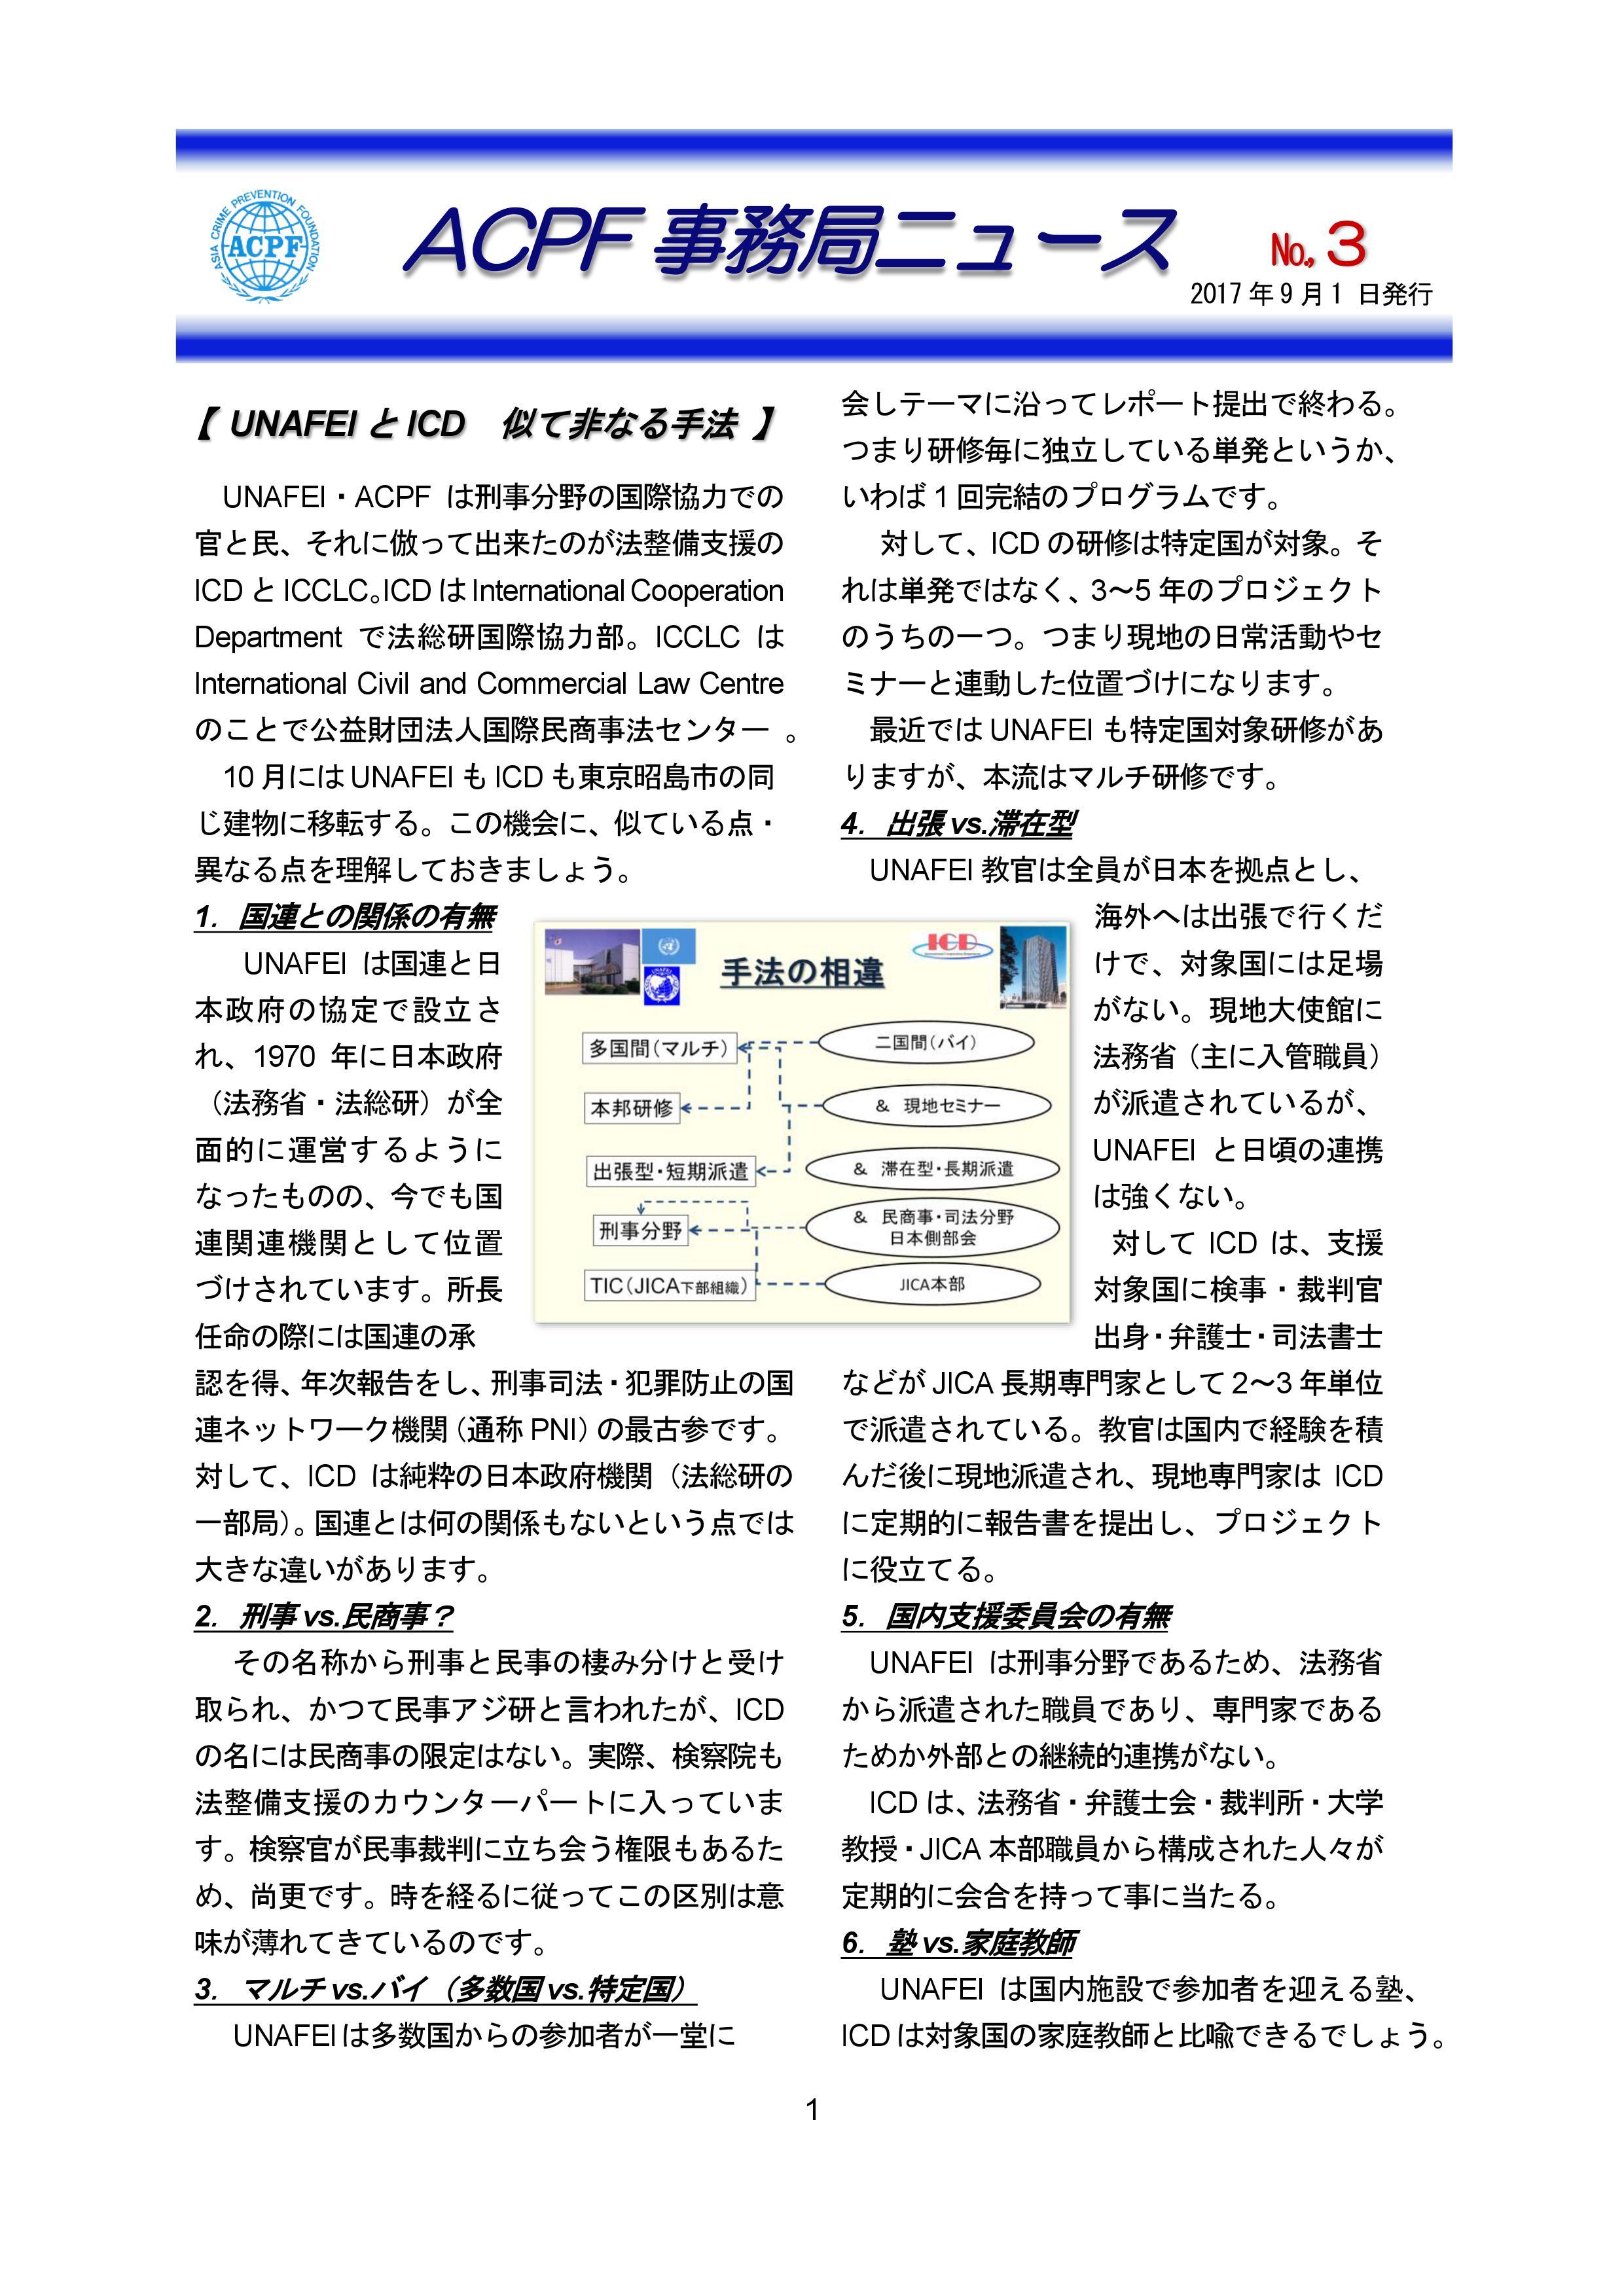 ACPF NEWS No.3